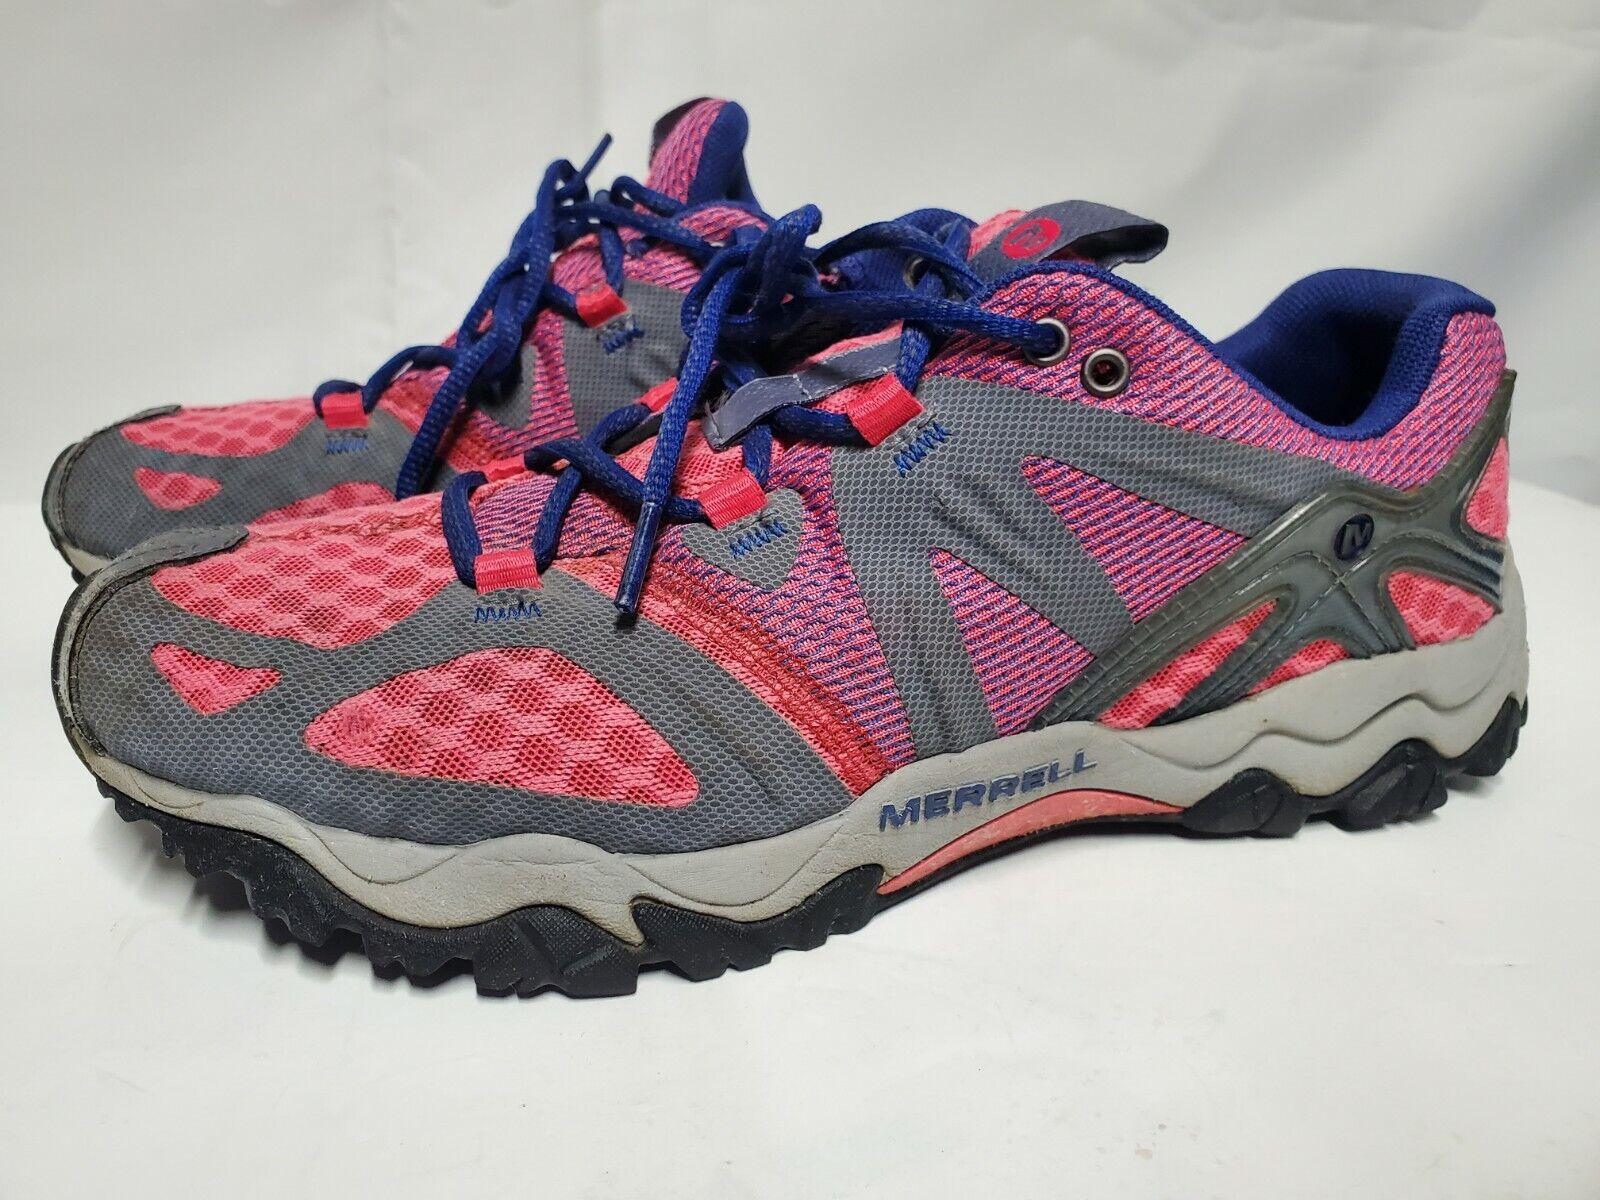 J24372 Trail Running Shoes 6m